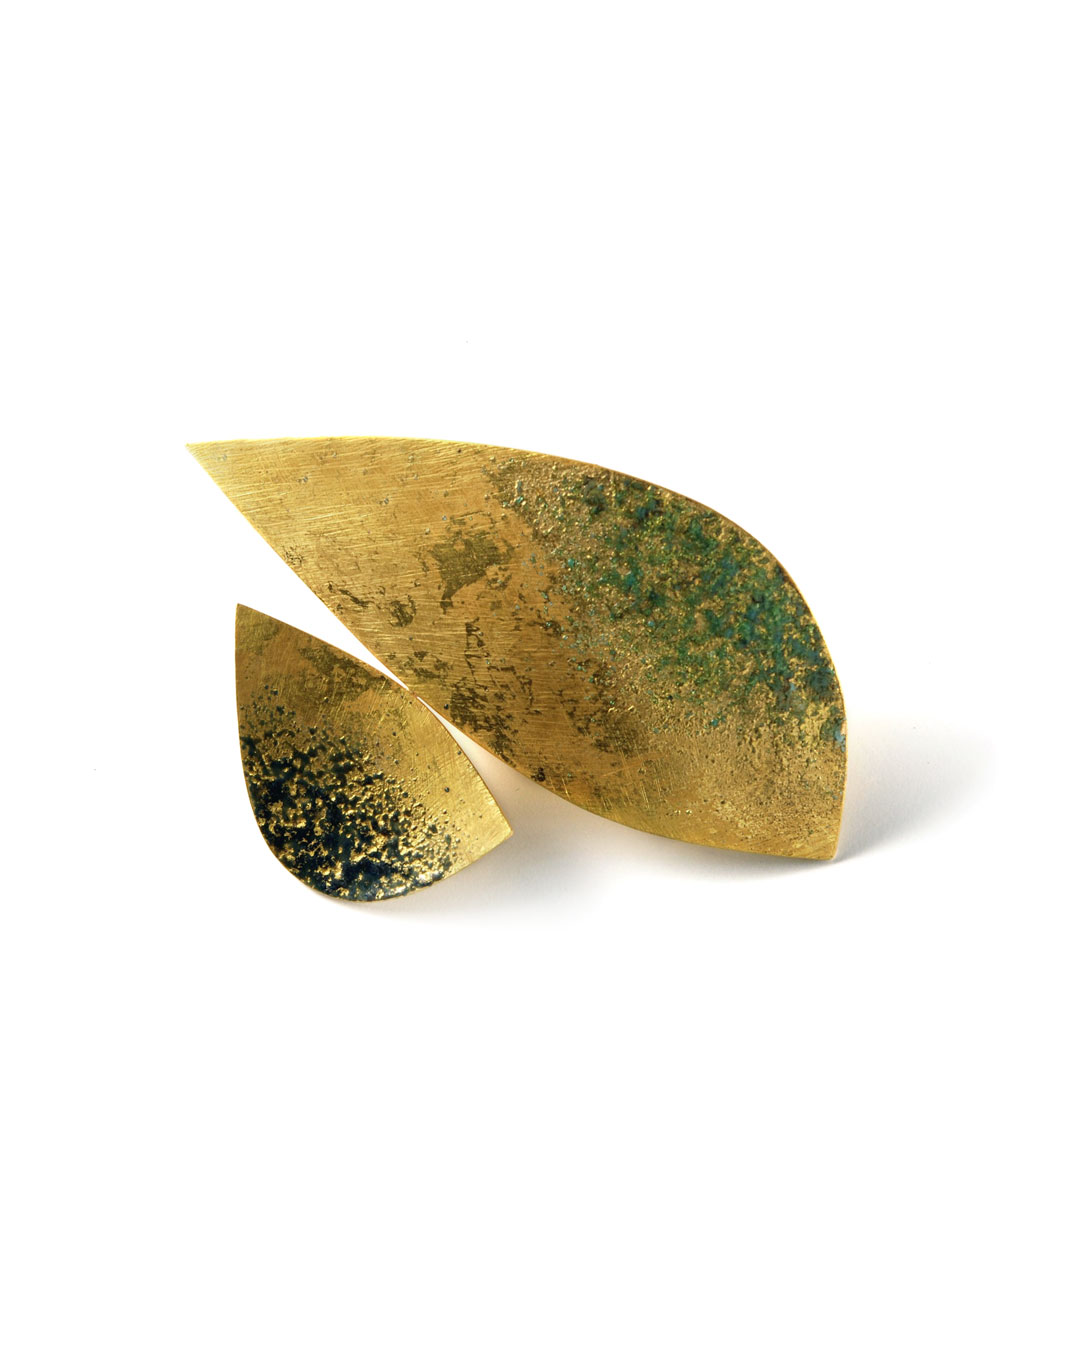 Graziano Visintin, untitled, 2007, brooch; gold, enamel, gold leaf, 56 x 80 mm, €7260